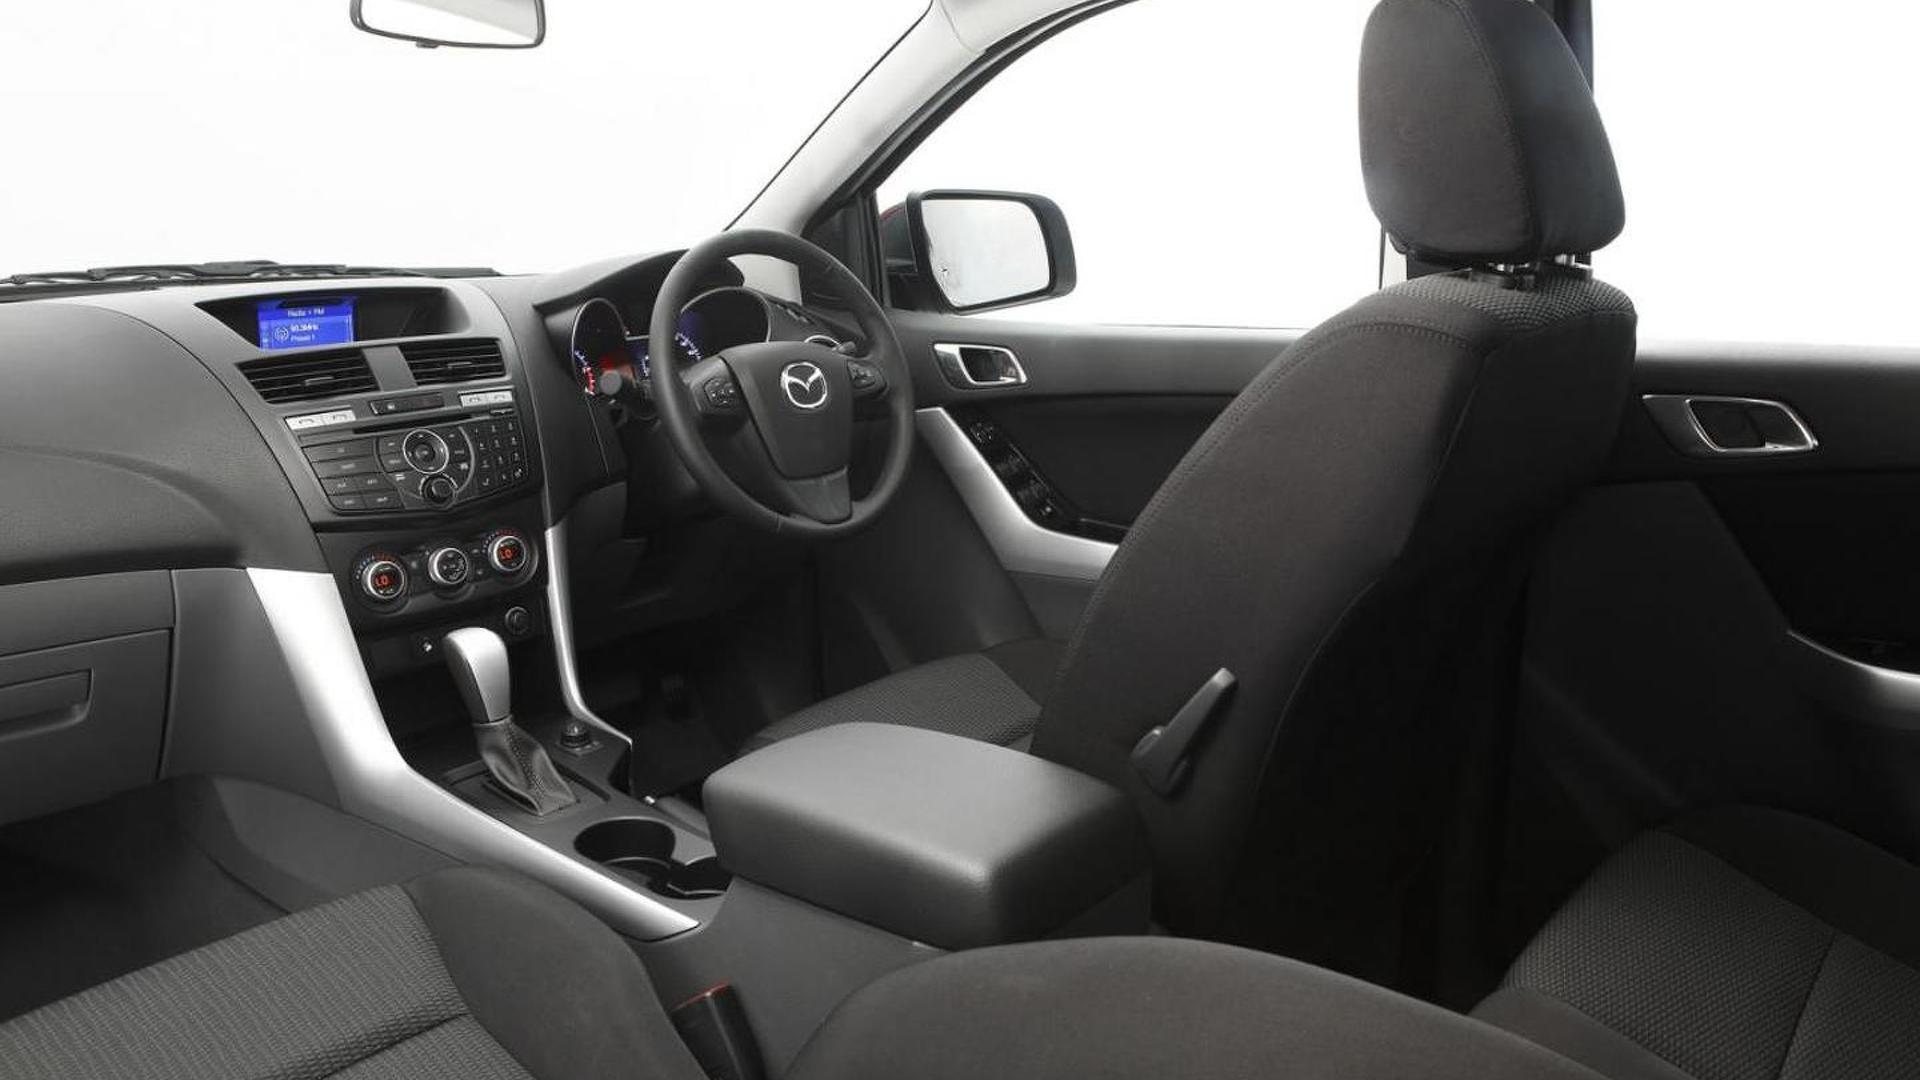 Mazda BT-50 unveiled